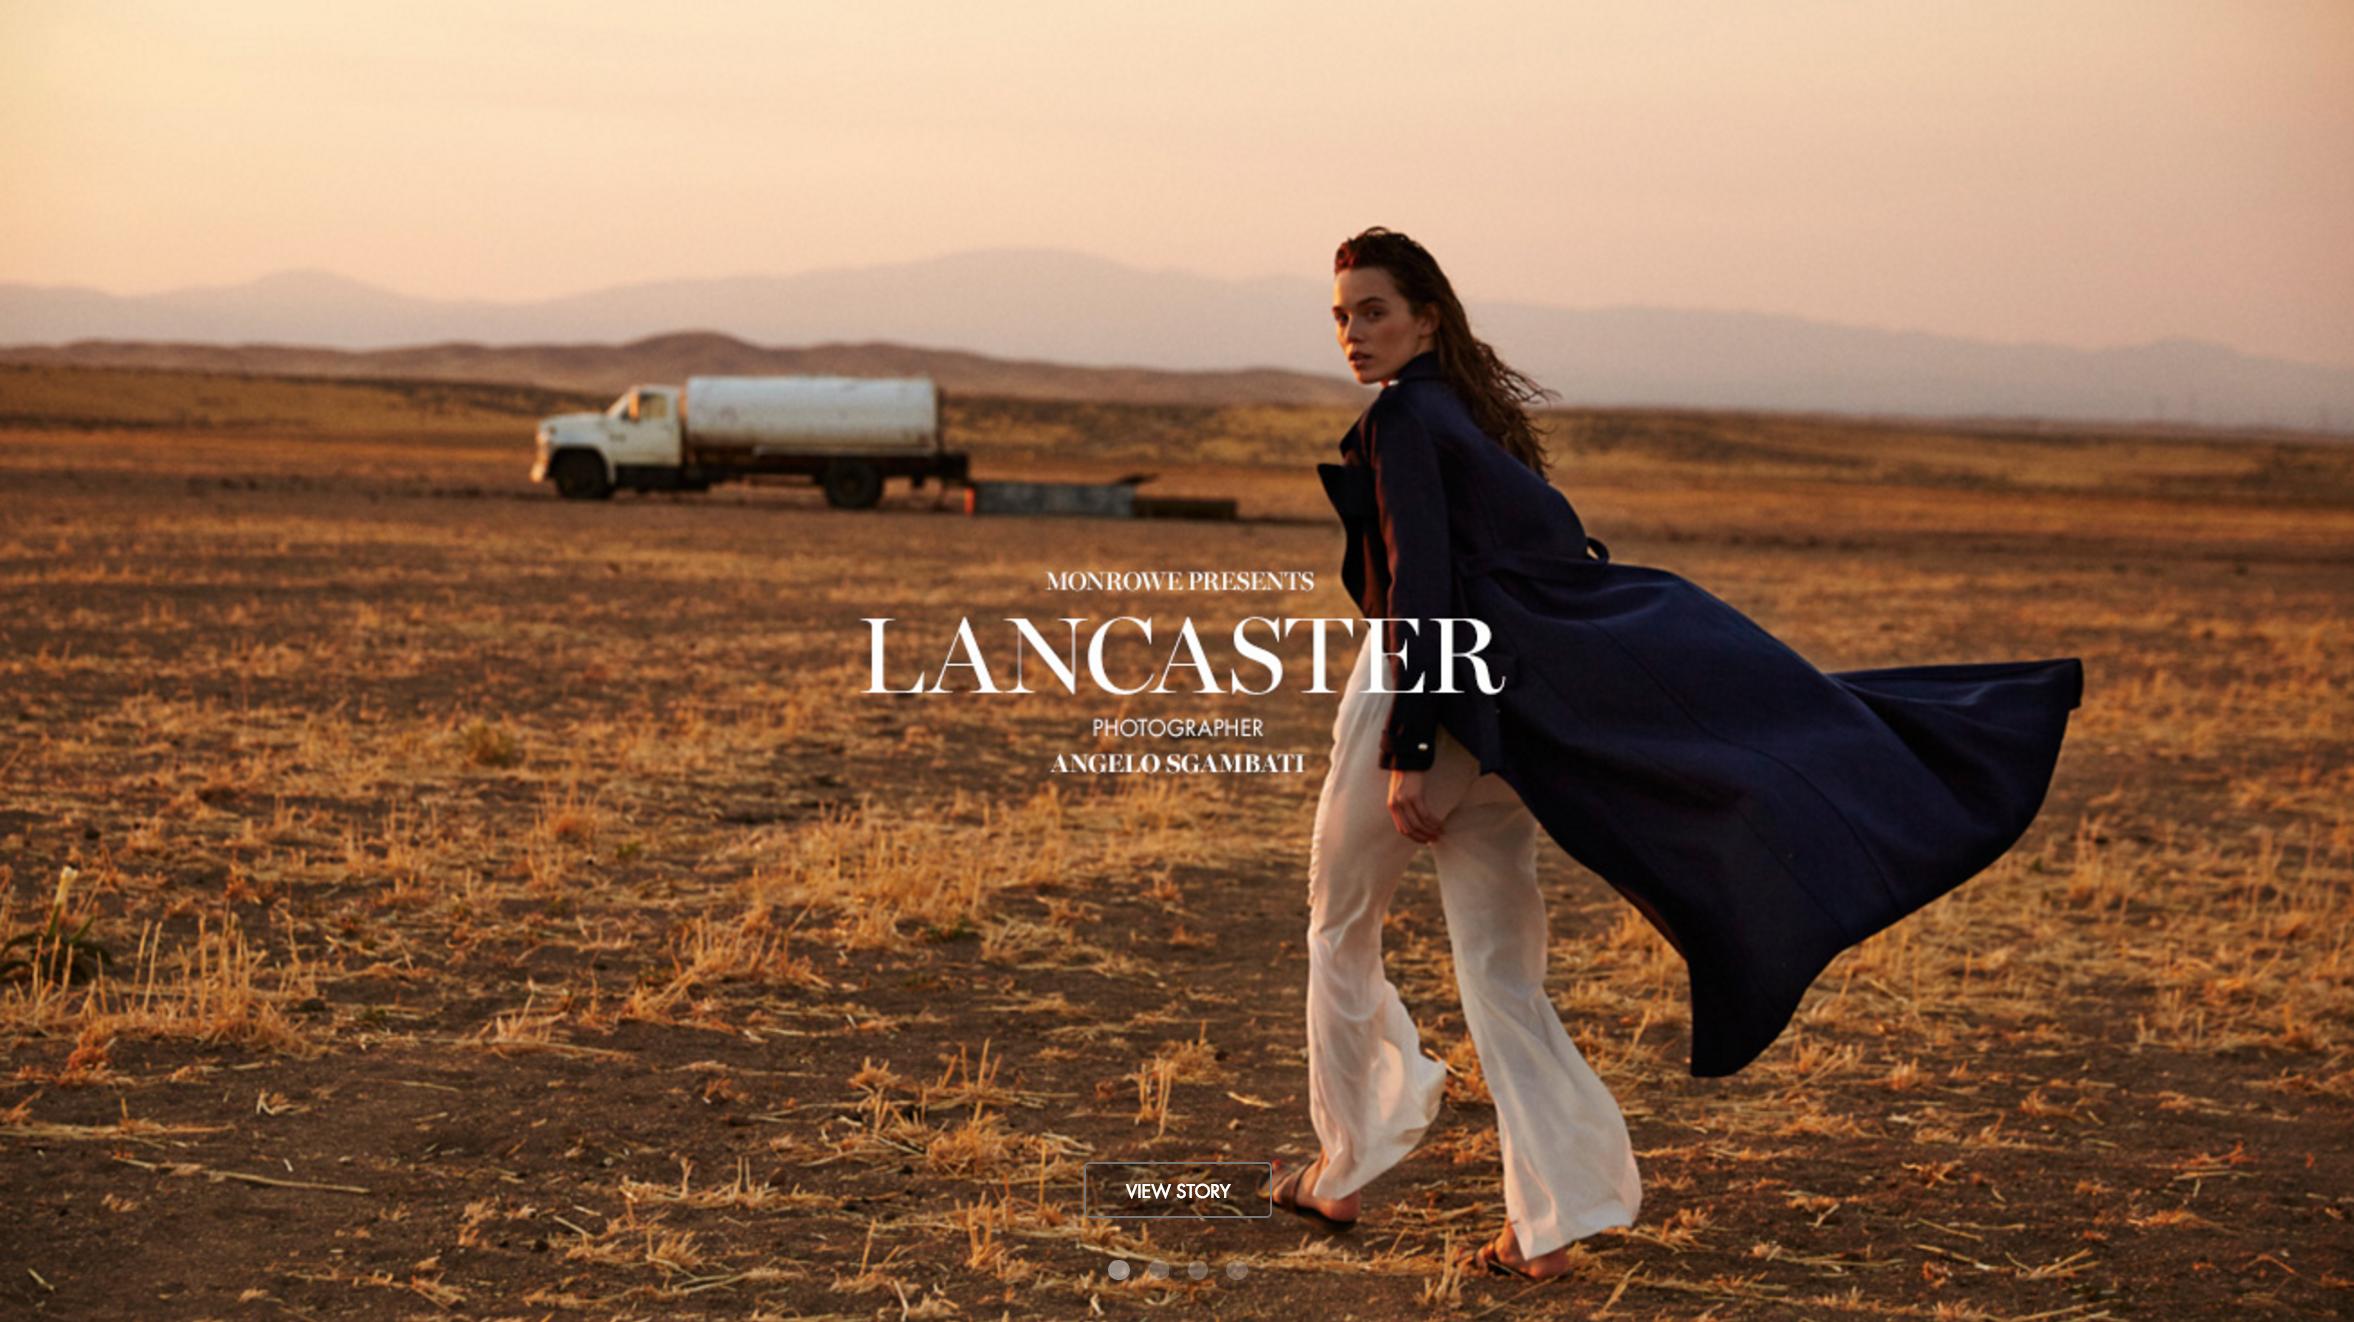 http://monrowemagazine.com/2016/08/03/the-lancaster/